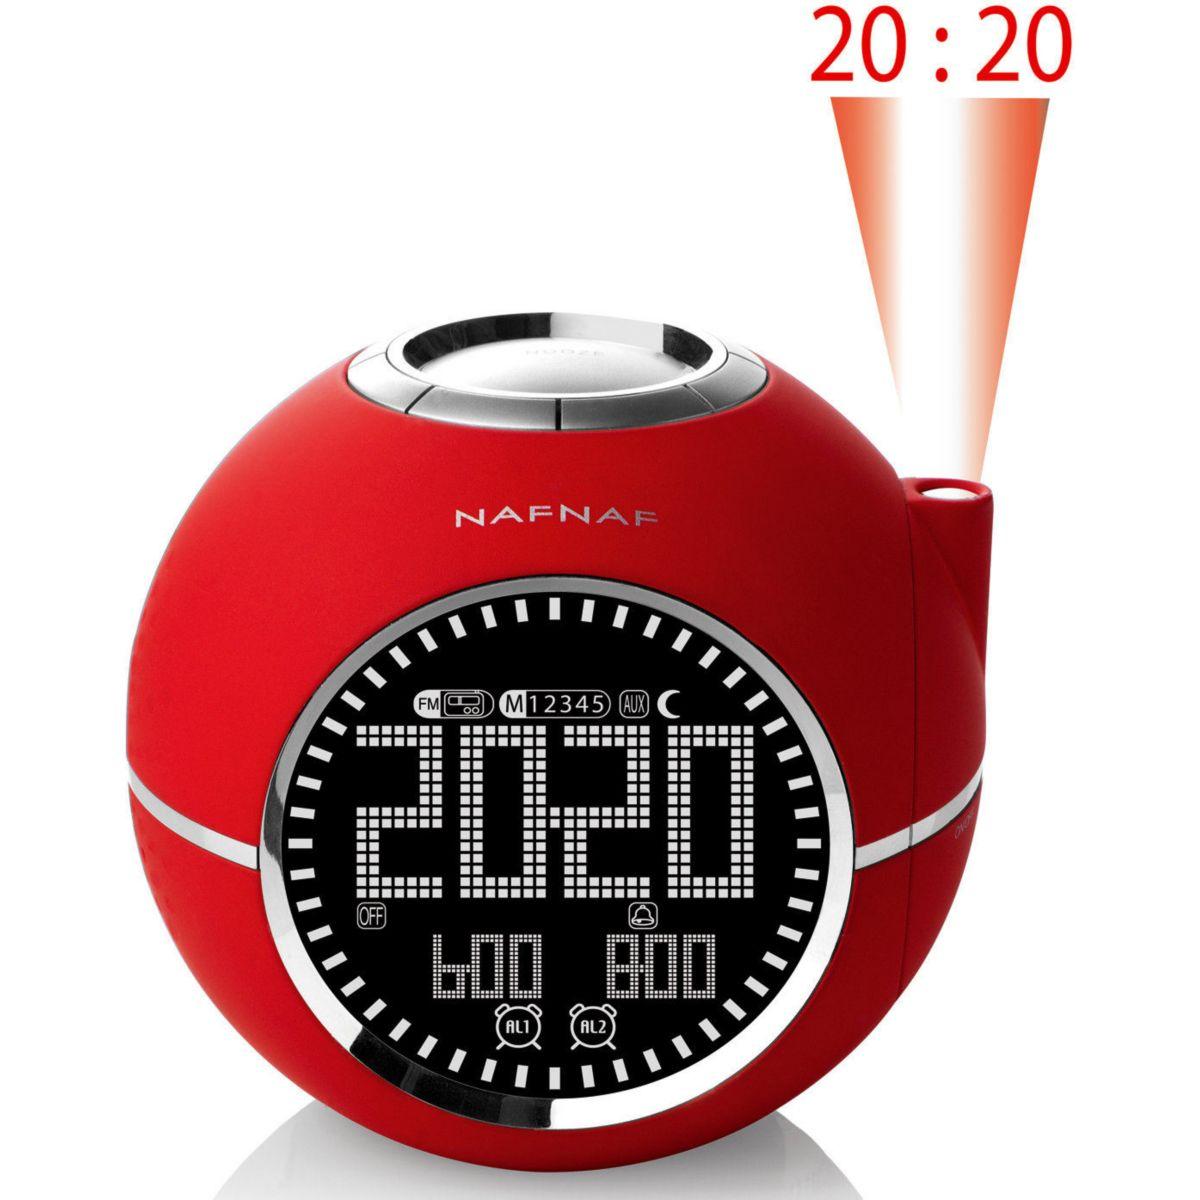 Radio-réveil nafnaf clockine rouge - 5% de remise : code multi5 (photo)